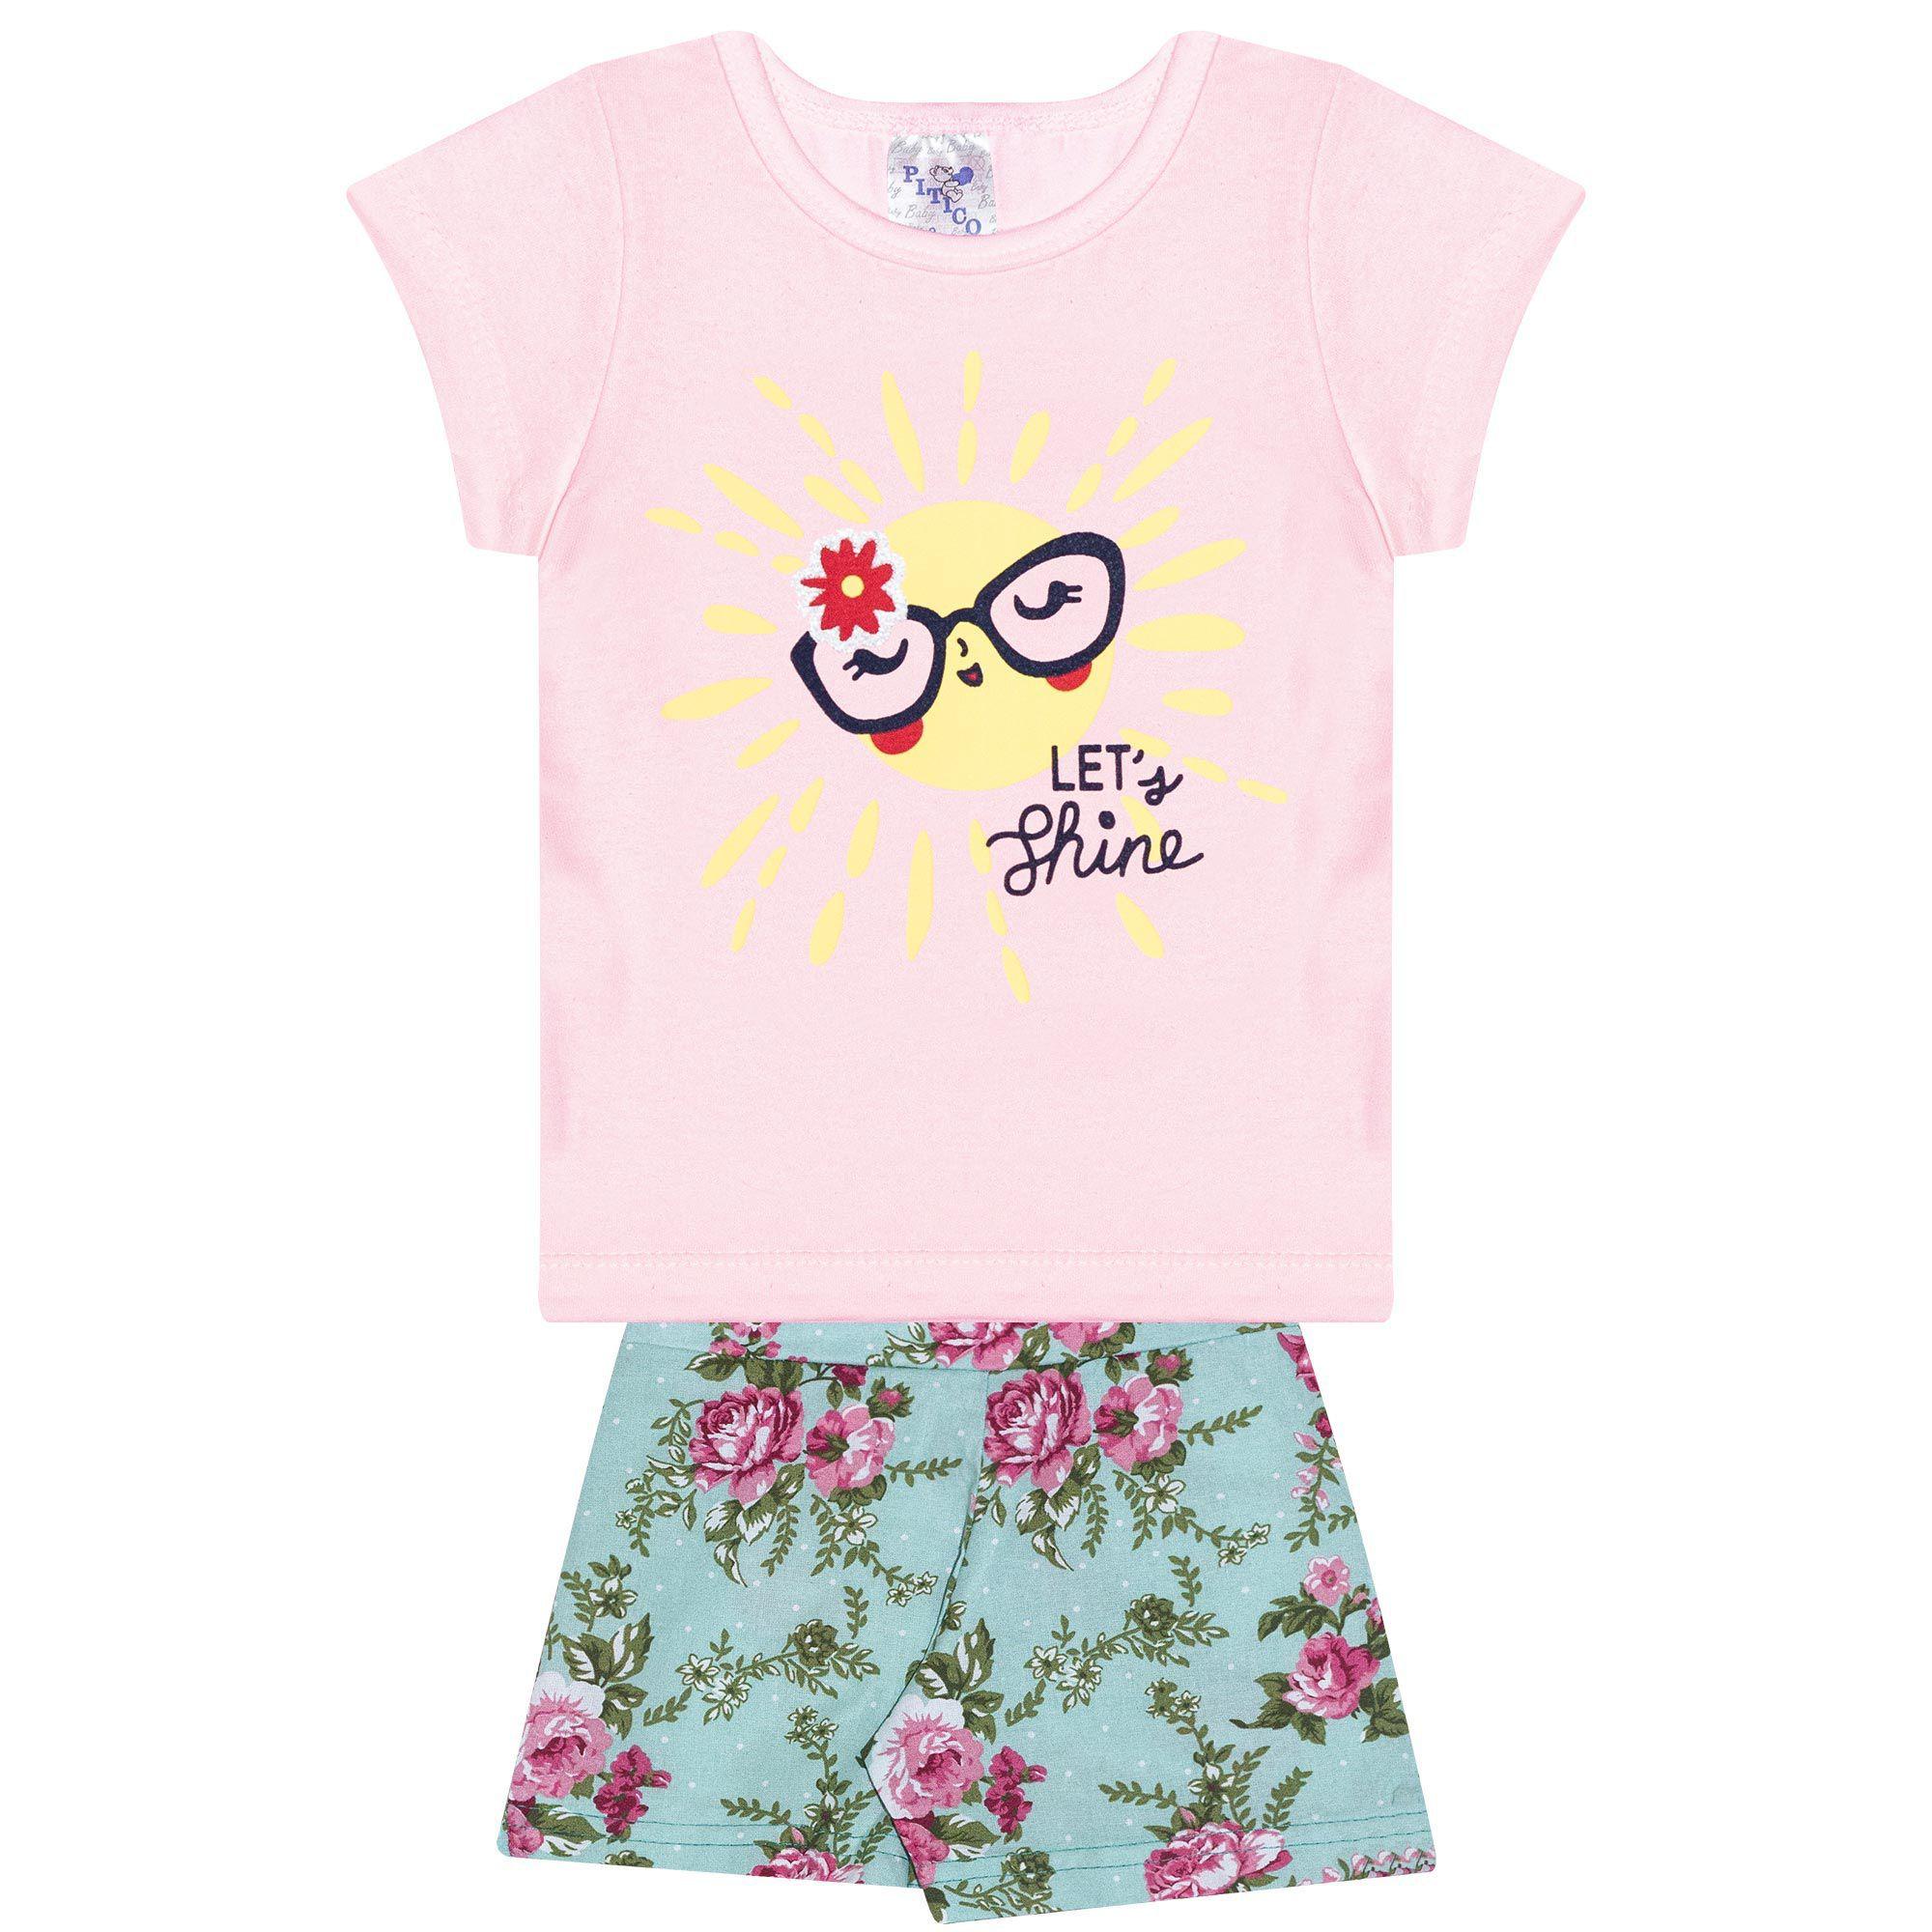 Conjunto Infantil Feminino - Ref 1035 - Rosa/Verde - Pitico